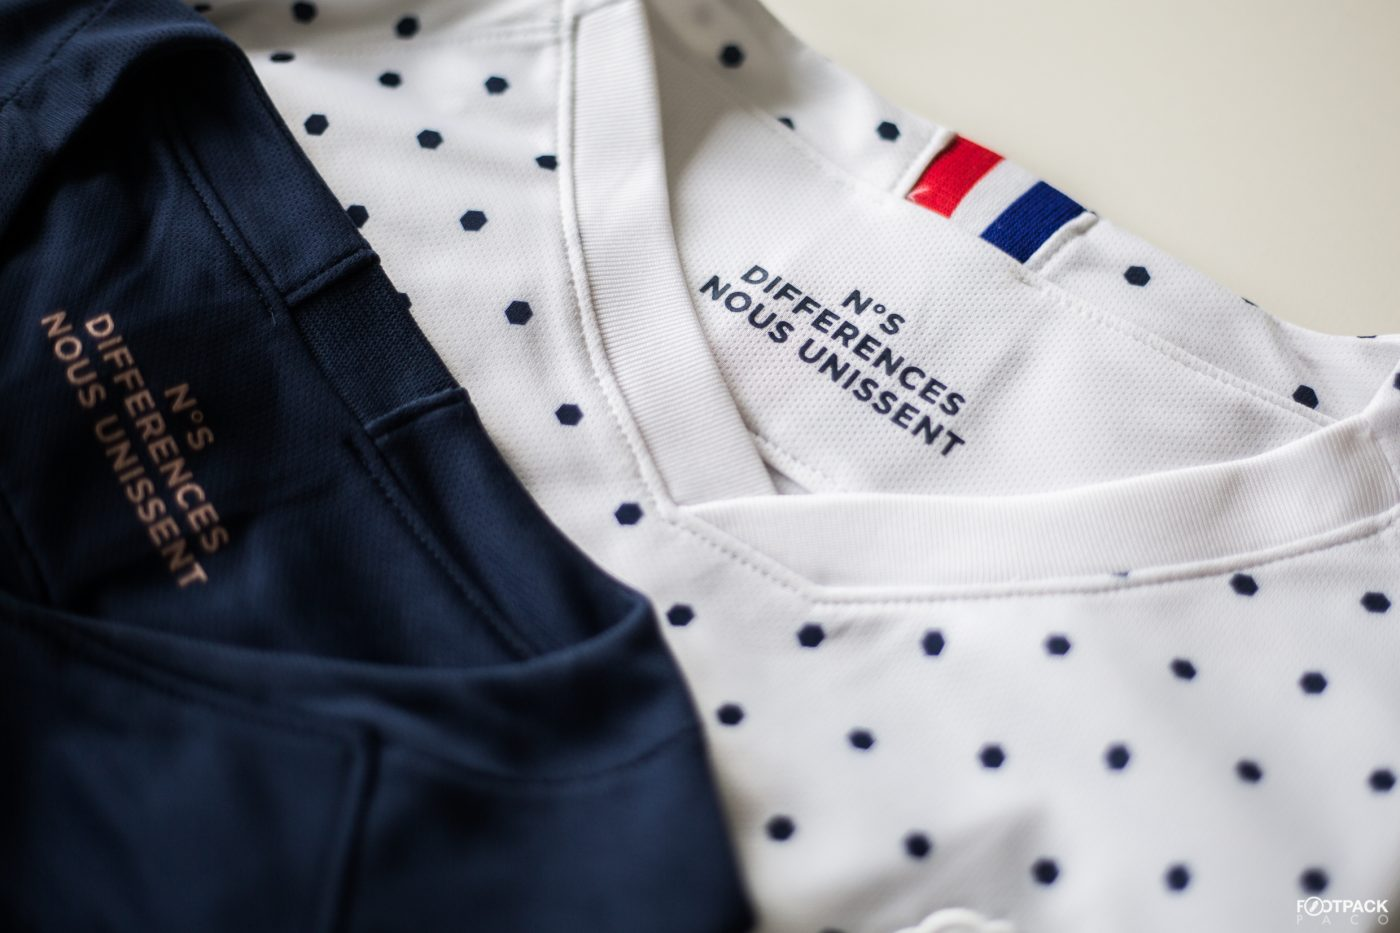 signification-nos-differences-nous-unissent-maillot-france-coupe-du-monde-feminine-nike-4